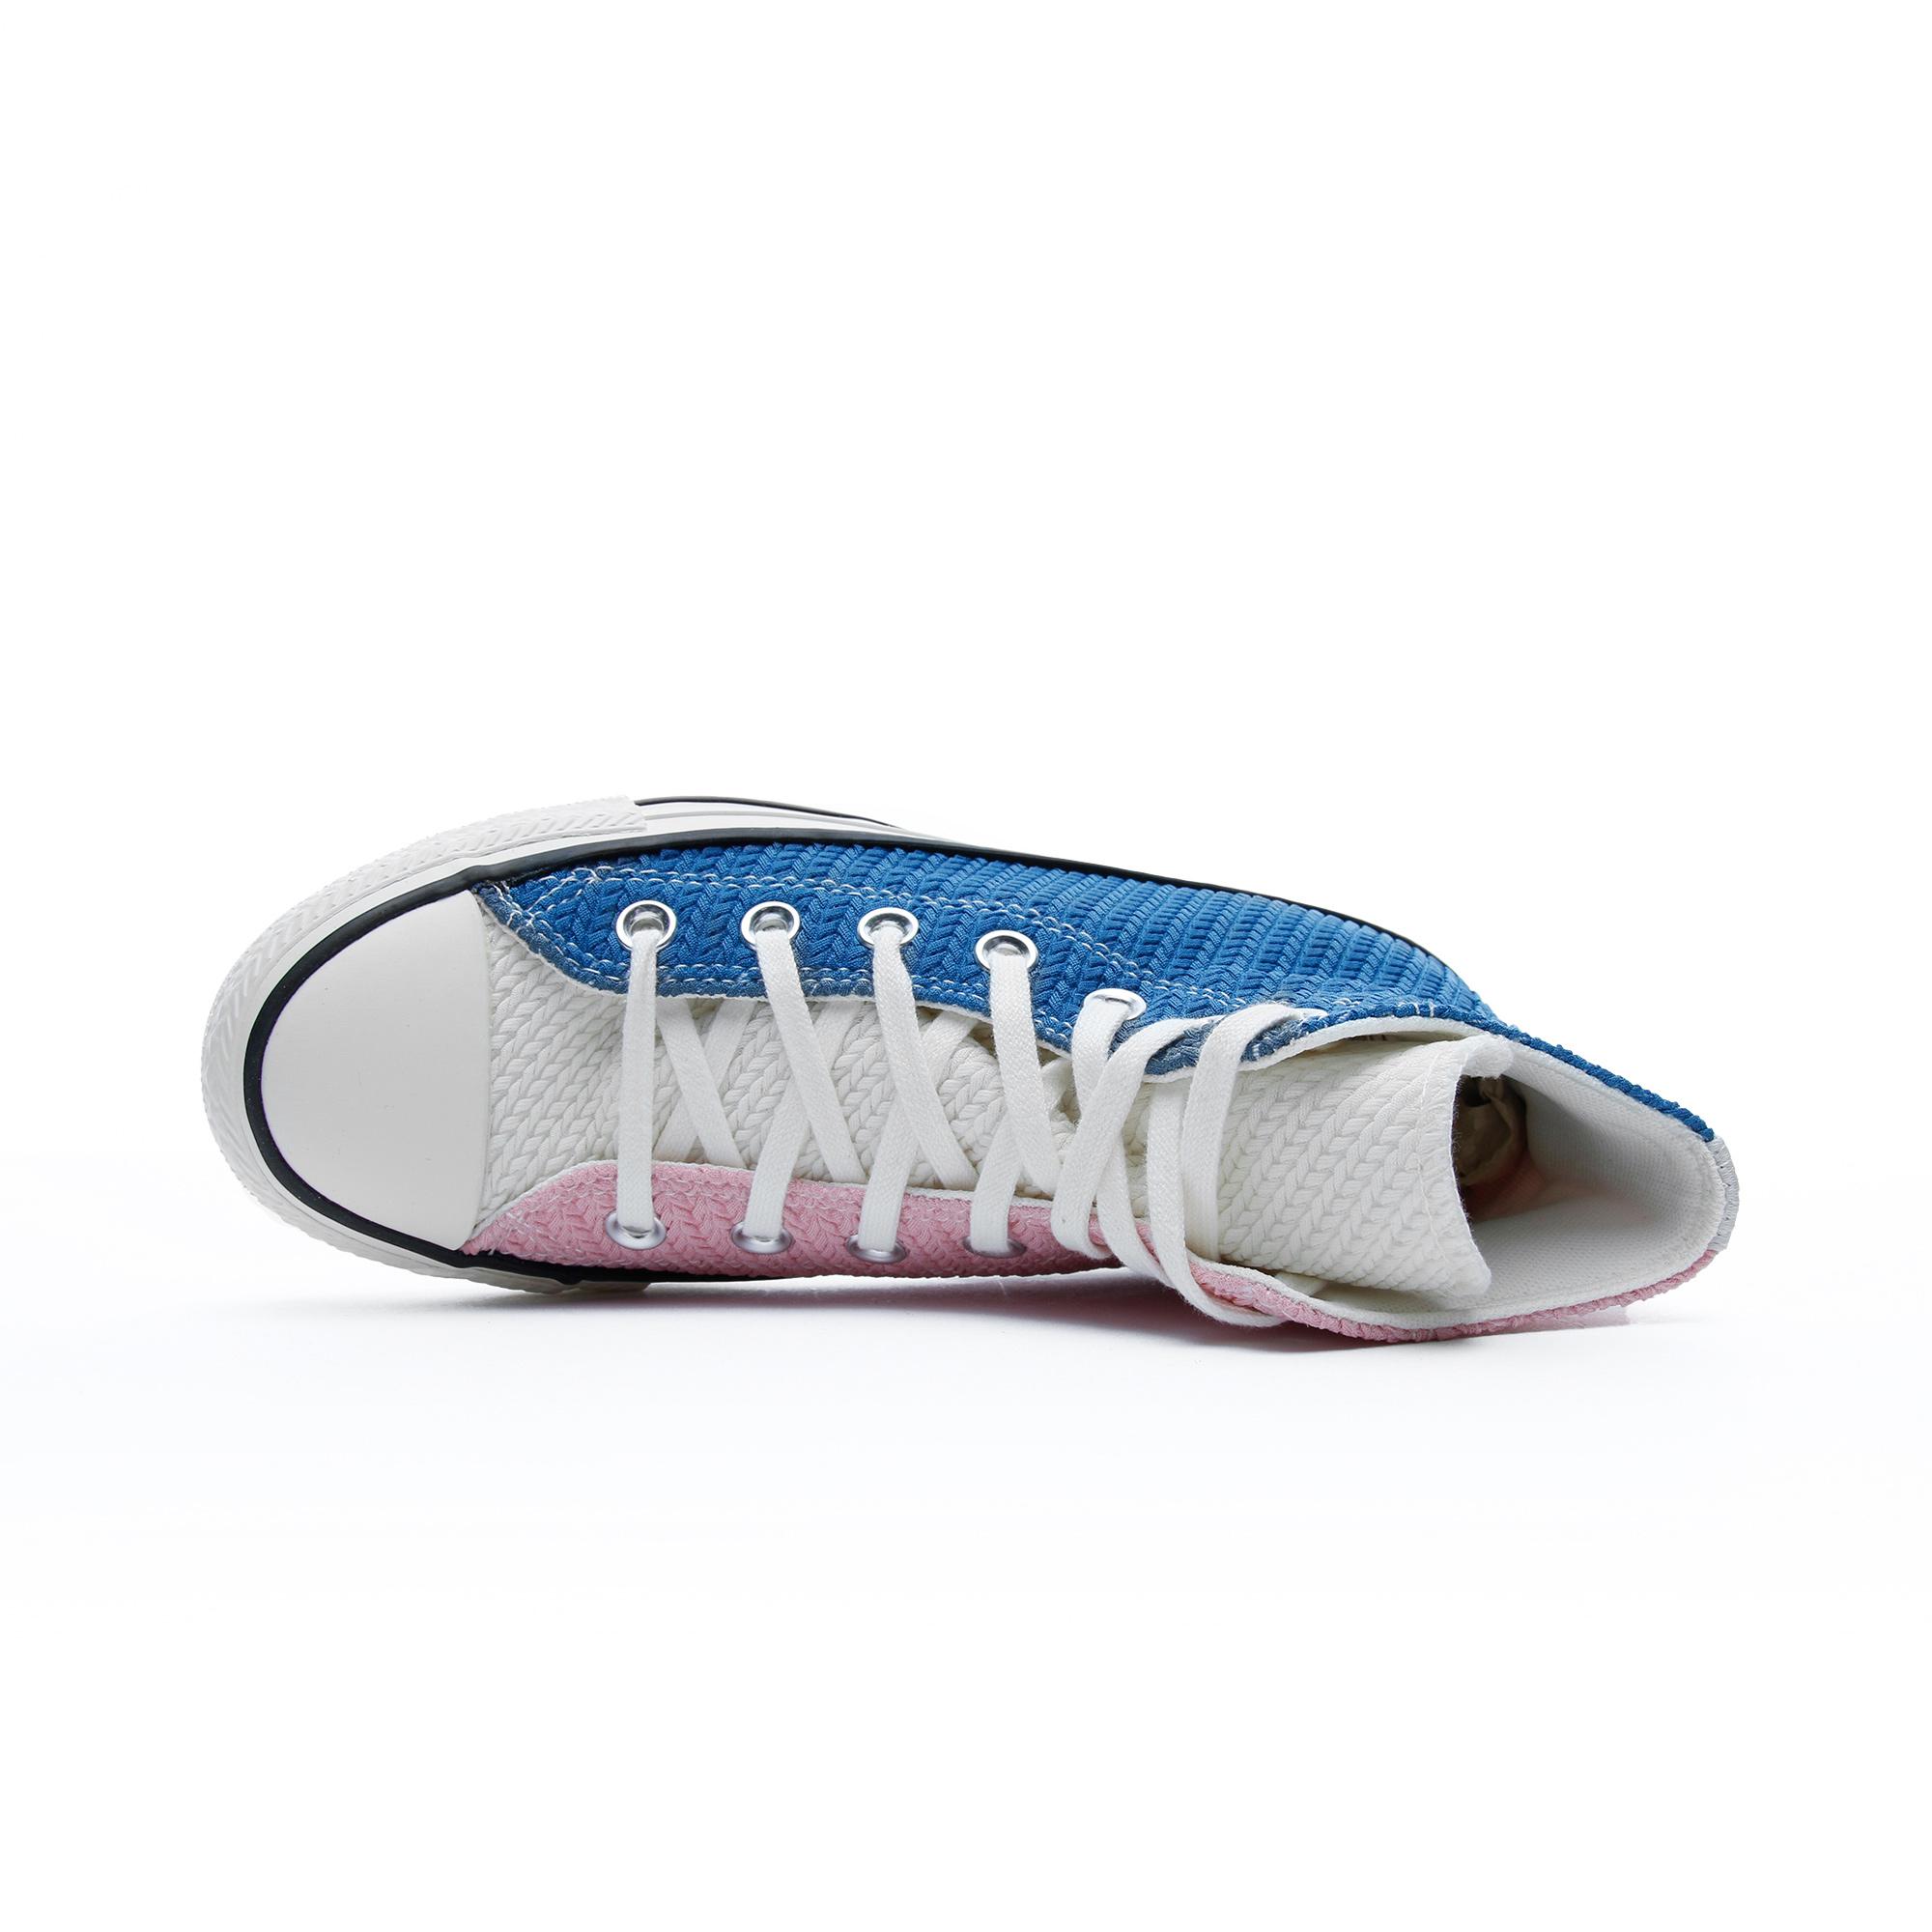 Converse Chuck Taylor All Star Hi Kadın Pembe- Mavi Sneaker